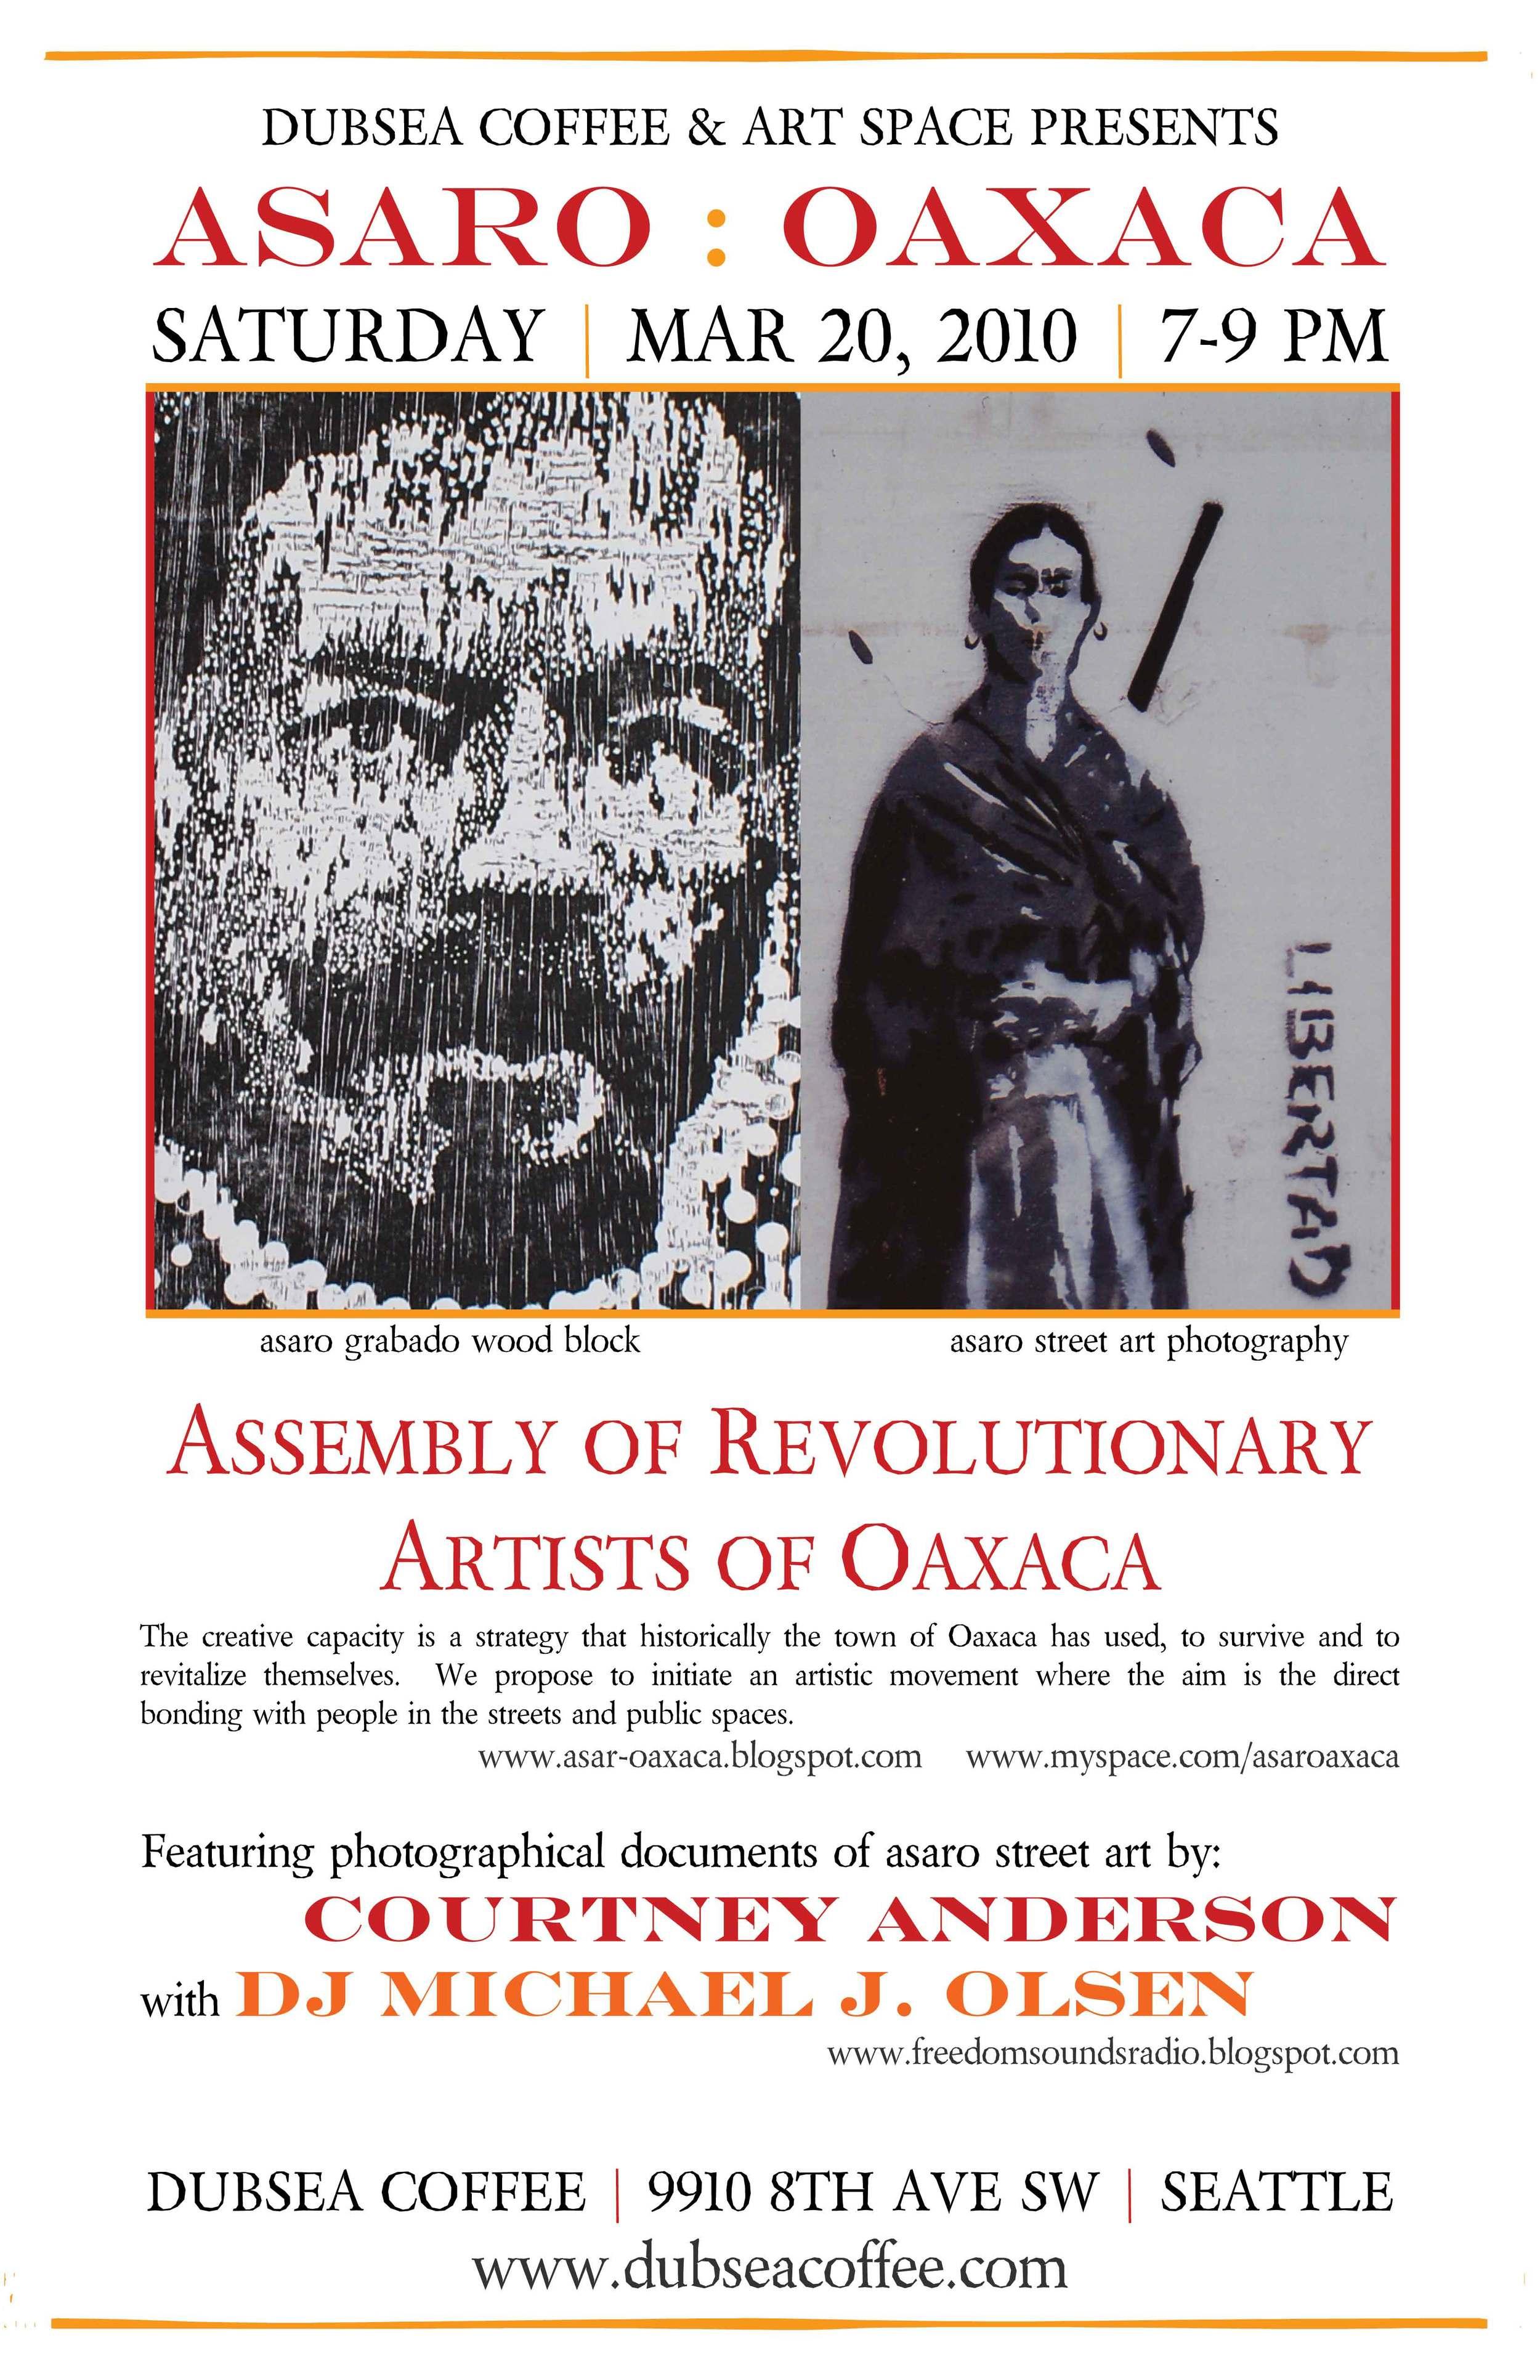 https://www.facebook.com/ASARO-asamblea-de-artistas-revolucionarios-de-Oaxaca-pagina-oficial-272341779588044/timeline/